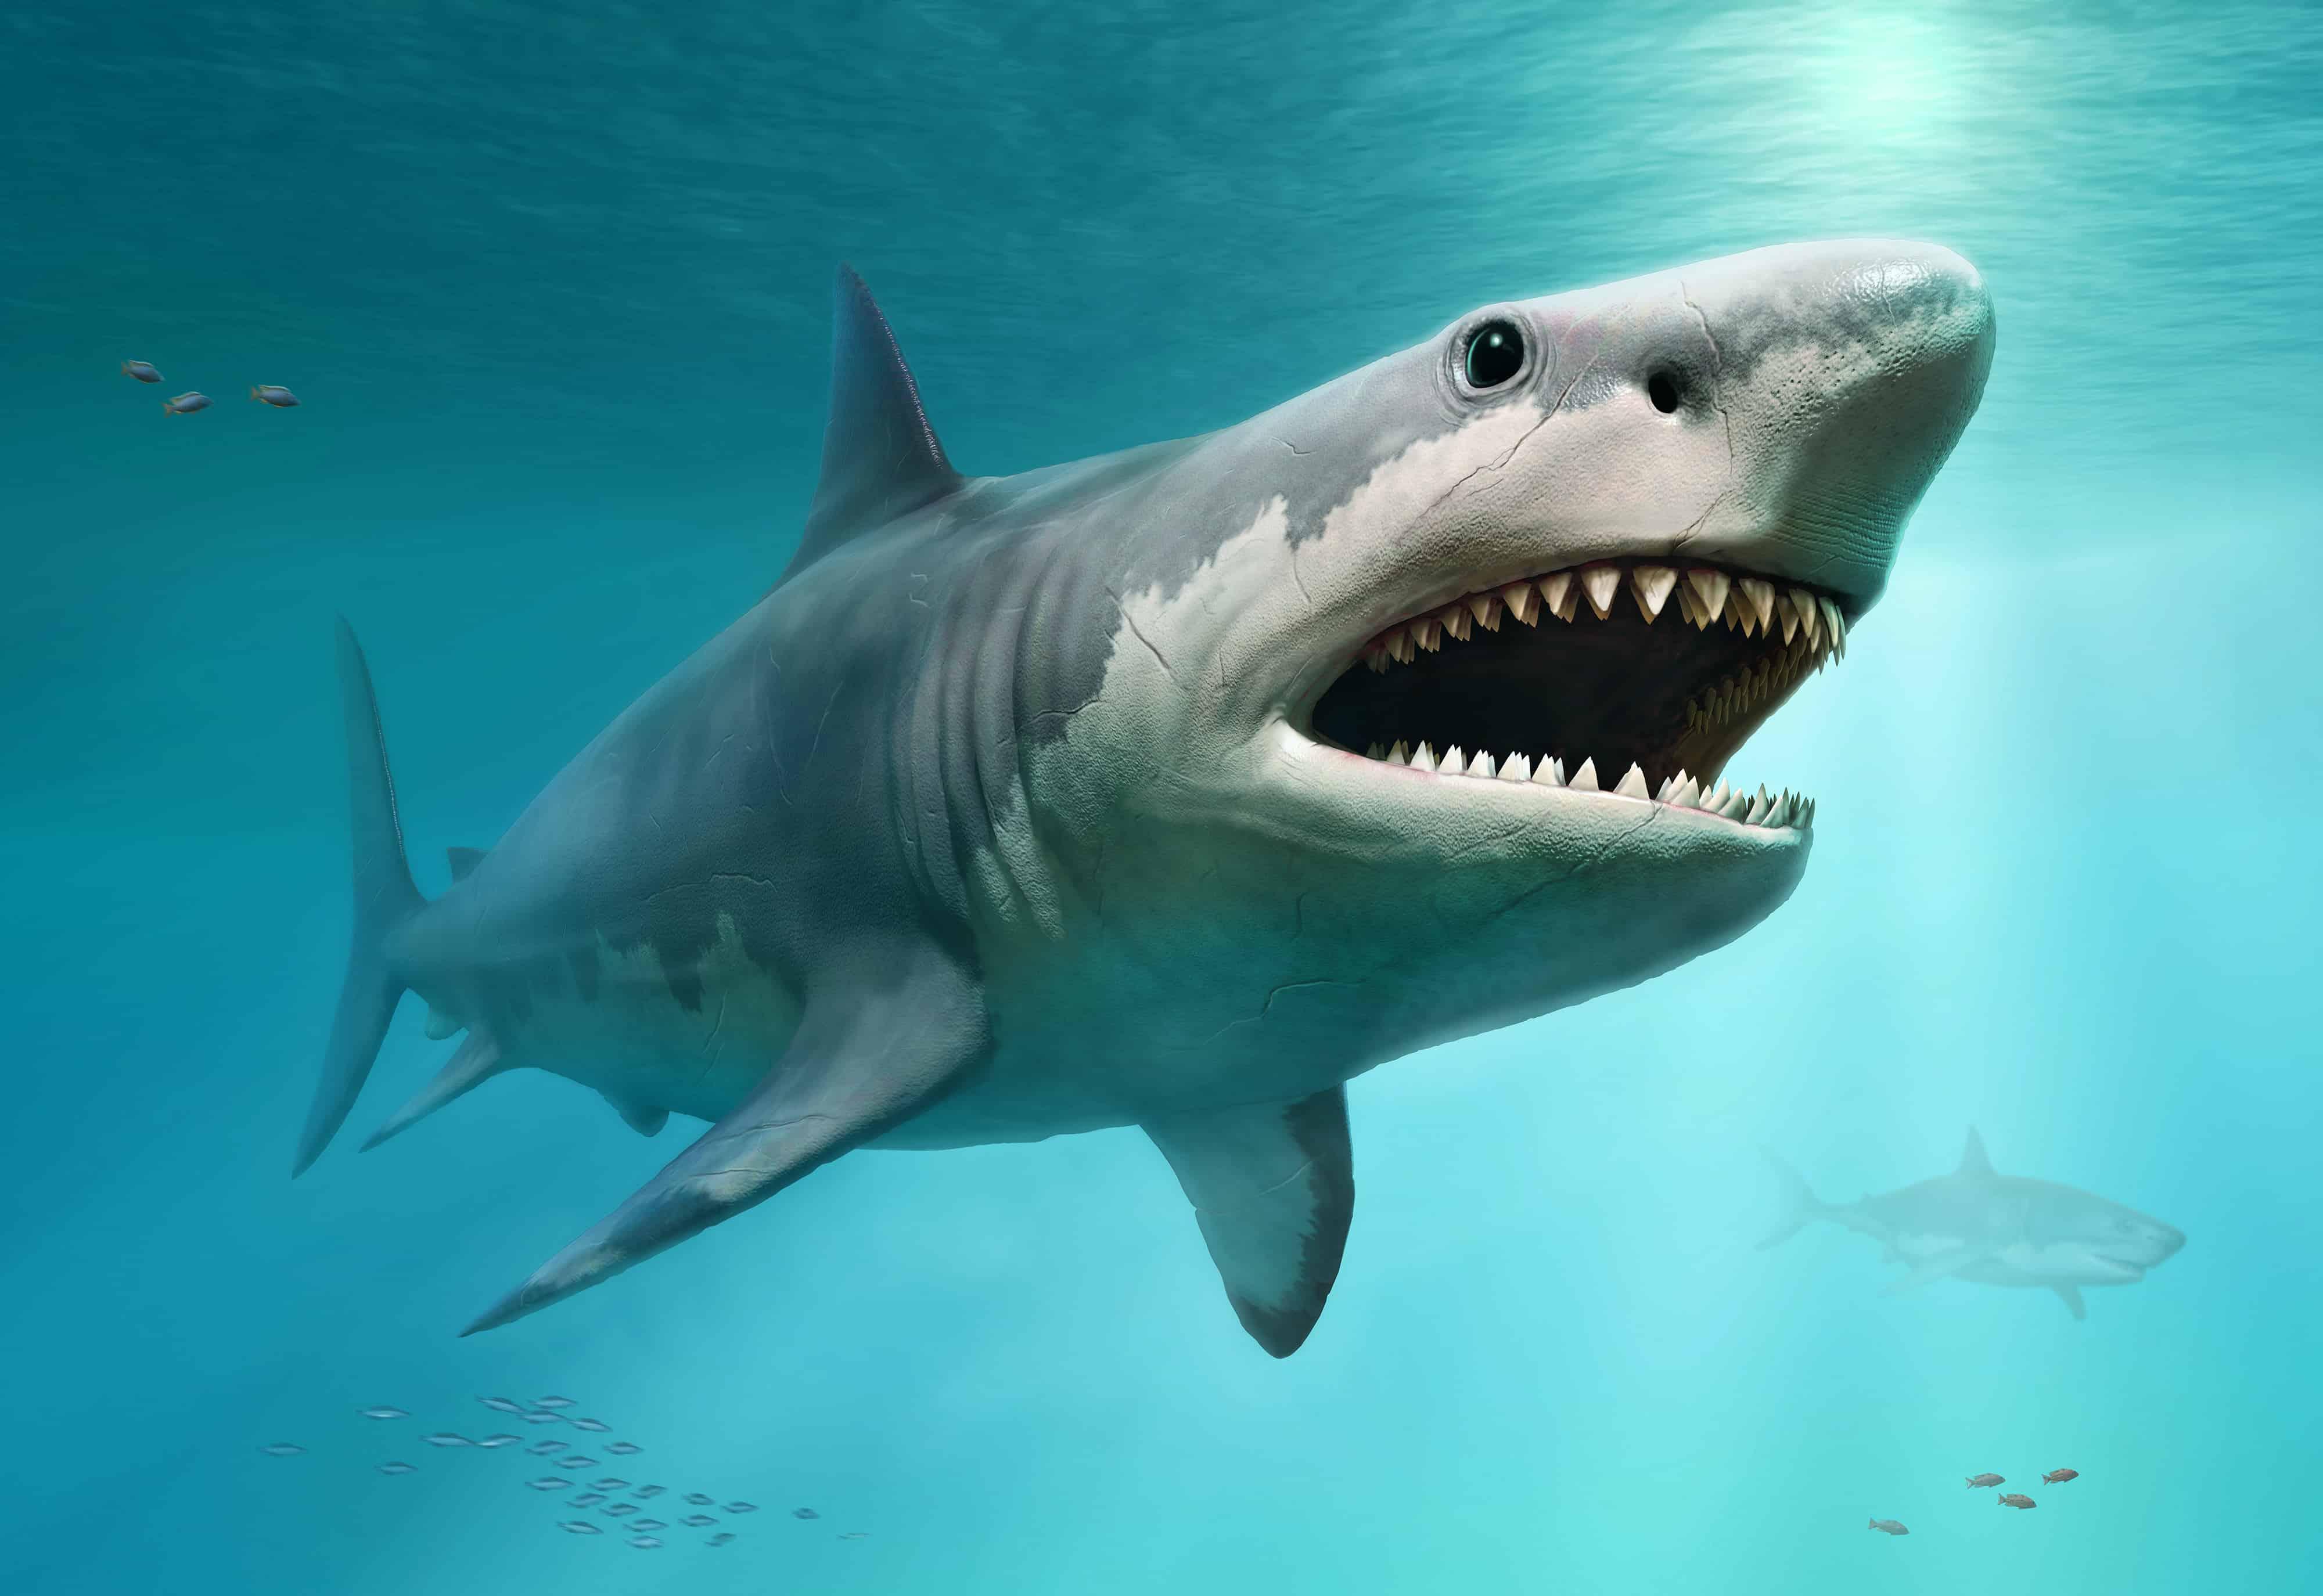 World's Biggest Shark Ever Captured: 40-Feet Long |Worlds Largest Bull Shark